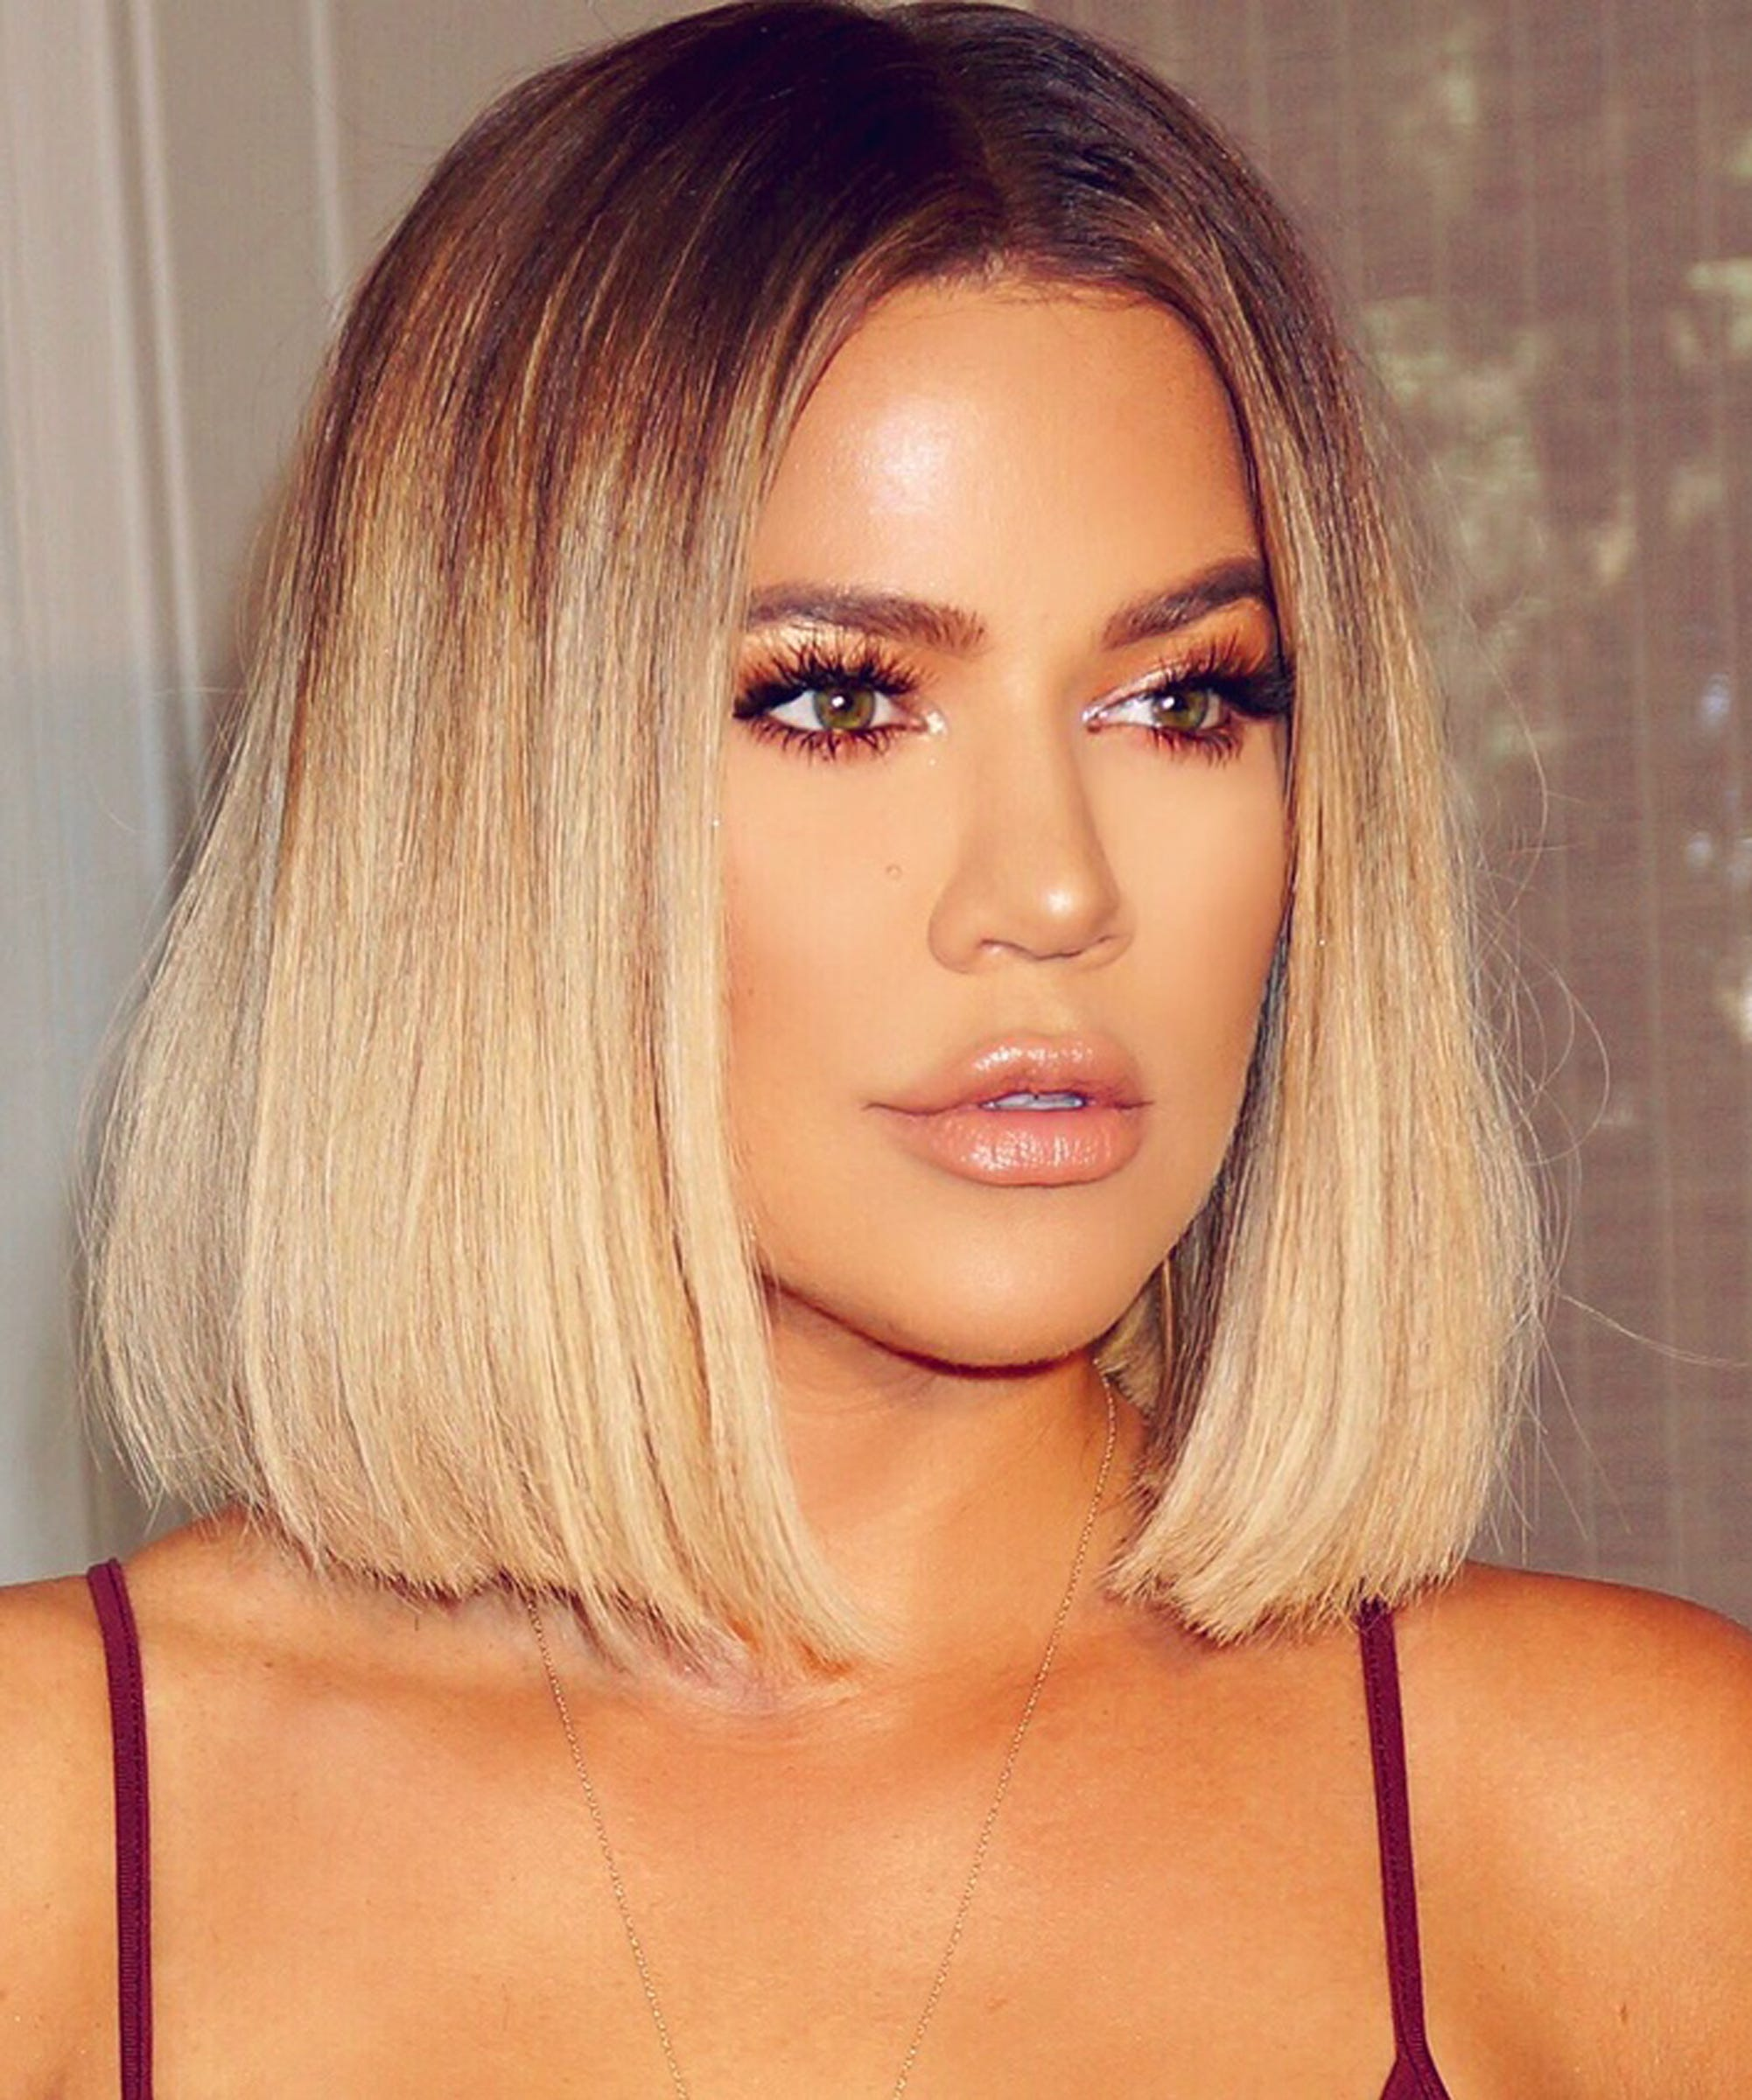 Khloe Kardashian Wigs Hair Trends Stylist Tips